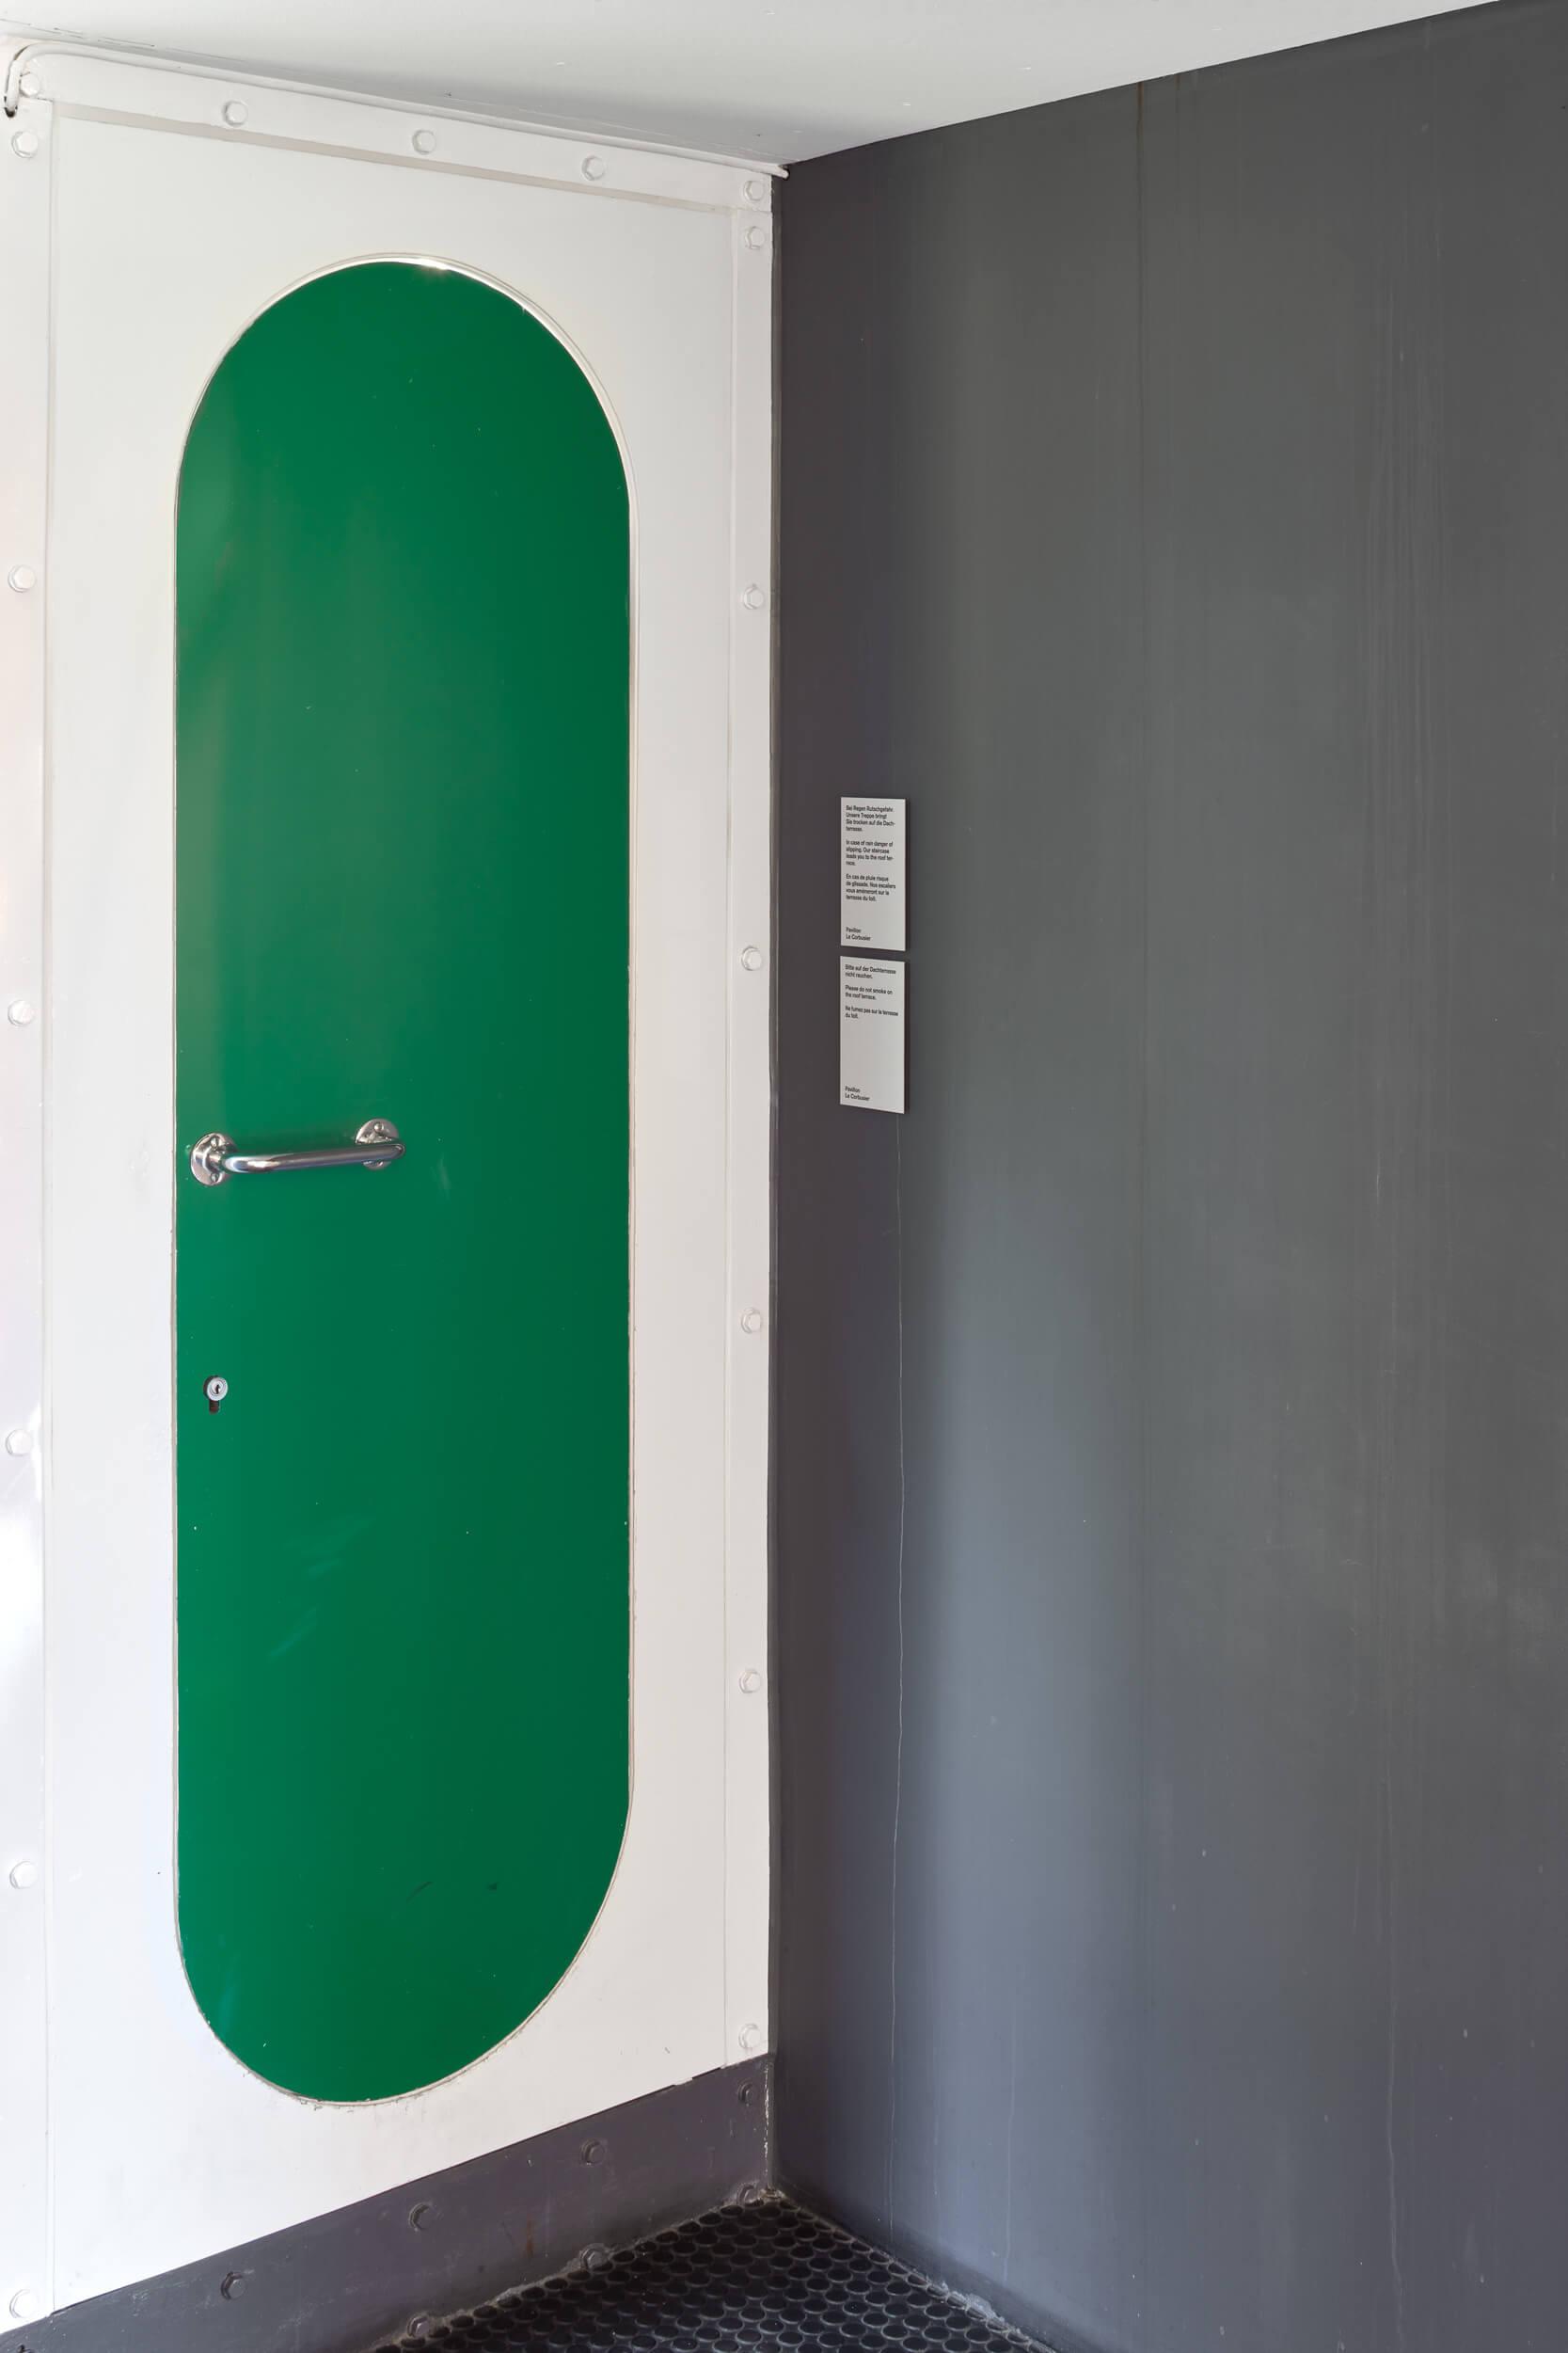 Pavillon Le Corbusier – Zürich – European Modern Architectural Heritage in the Twentieth-century